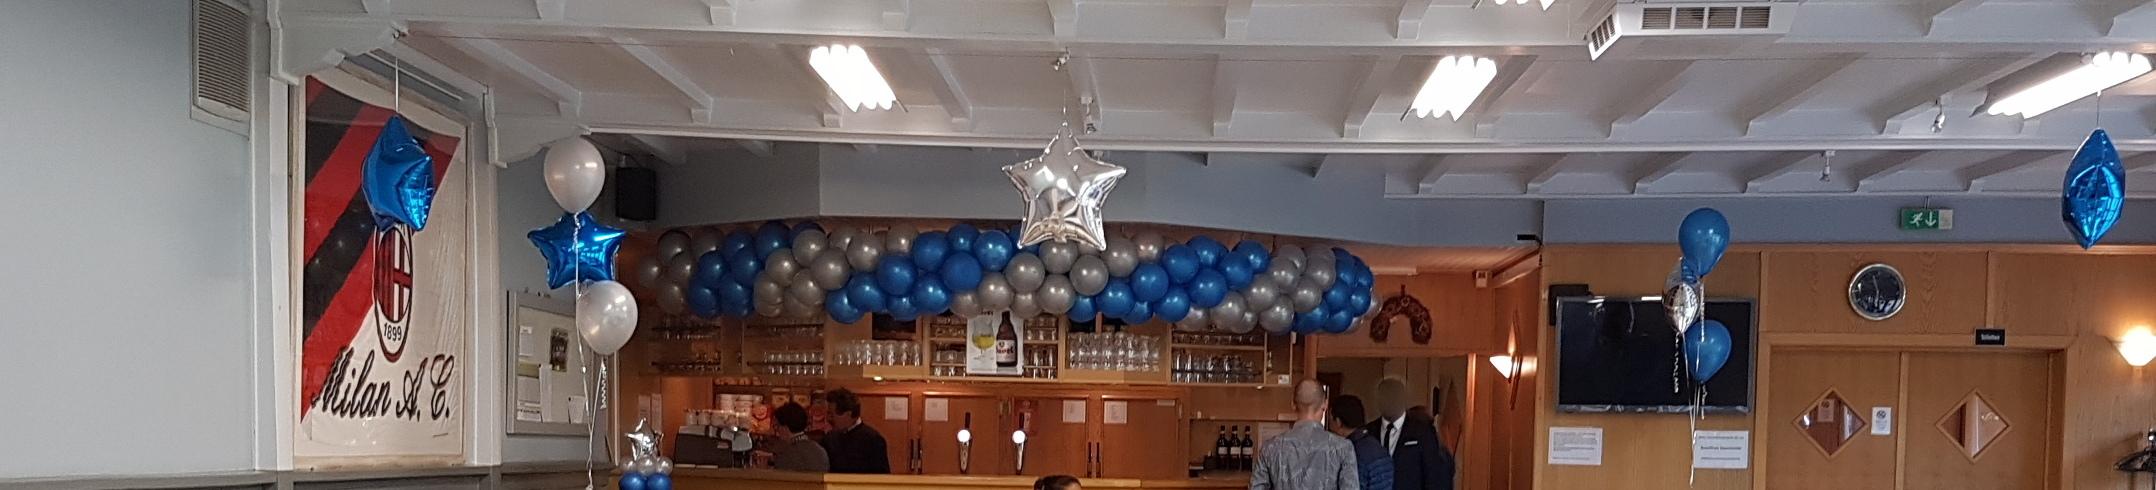 ballonnenslinger Neerpelt boven de bar